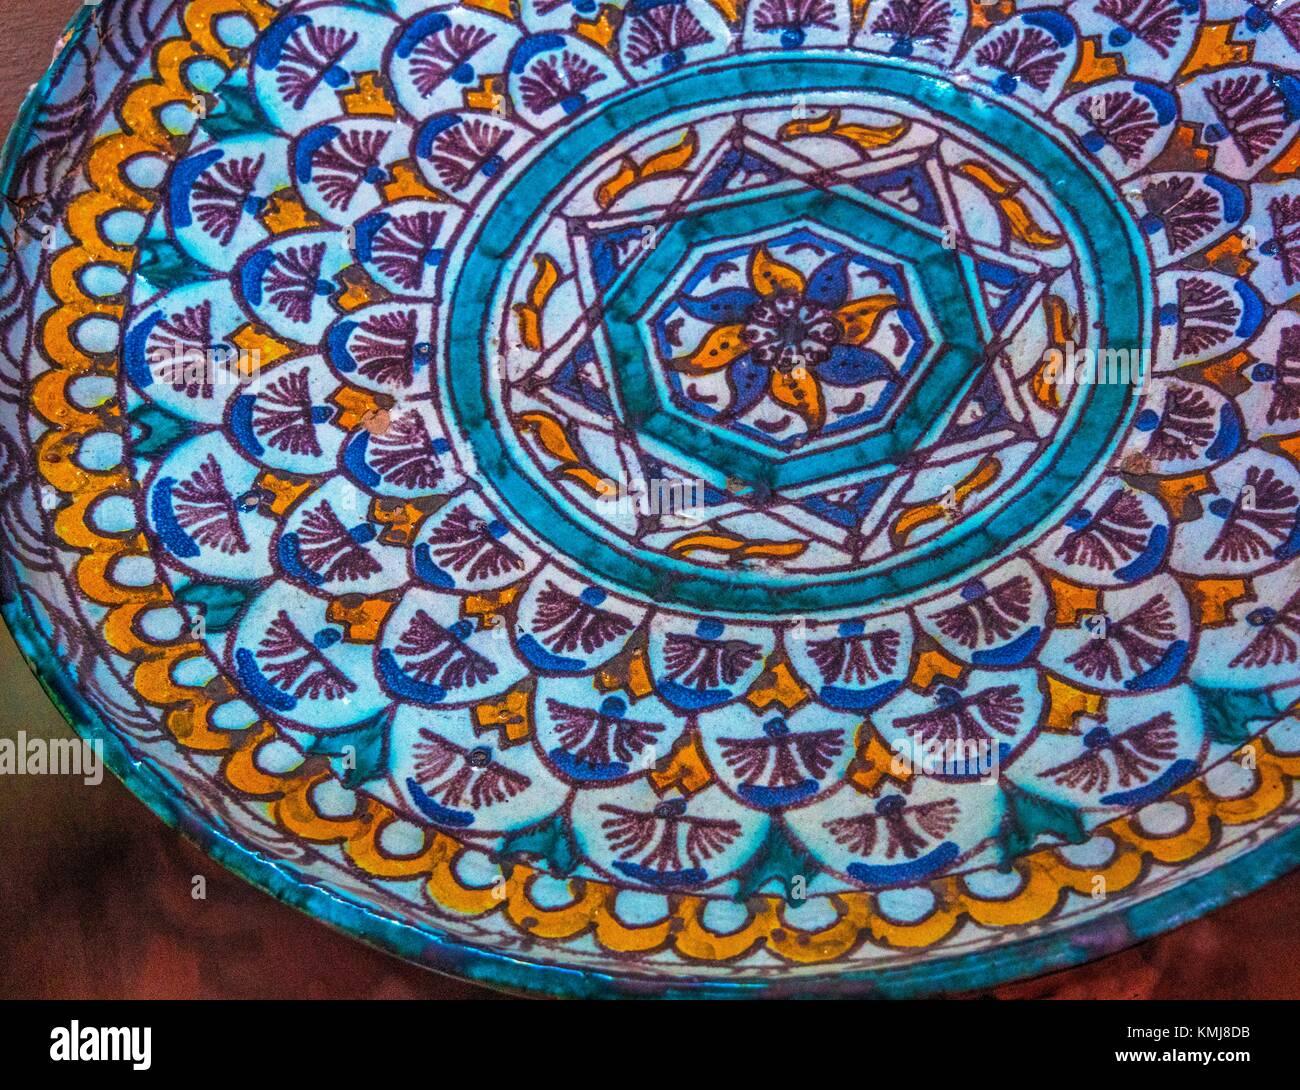 "Marokko, Meknes, Dar Jamaï Museum: Keramik Teller"" Ghtar' für Couscous Präsentation. XIXc. Stockbild"